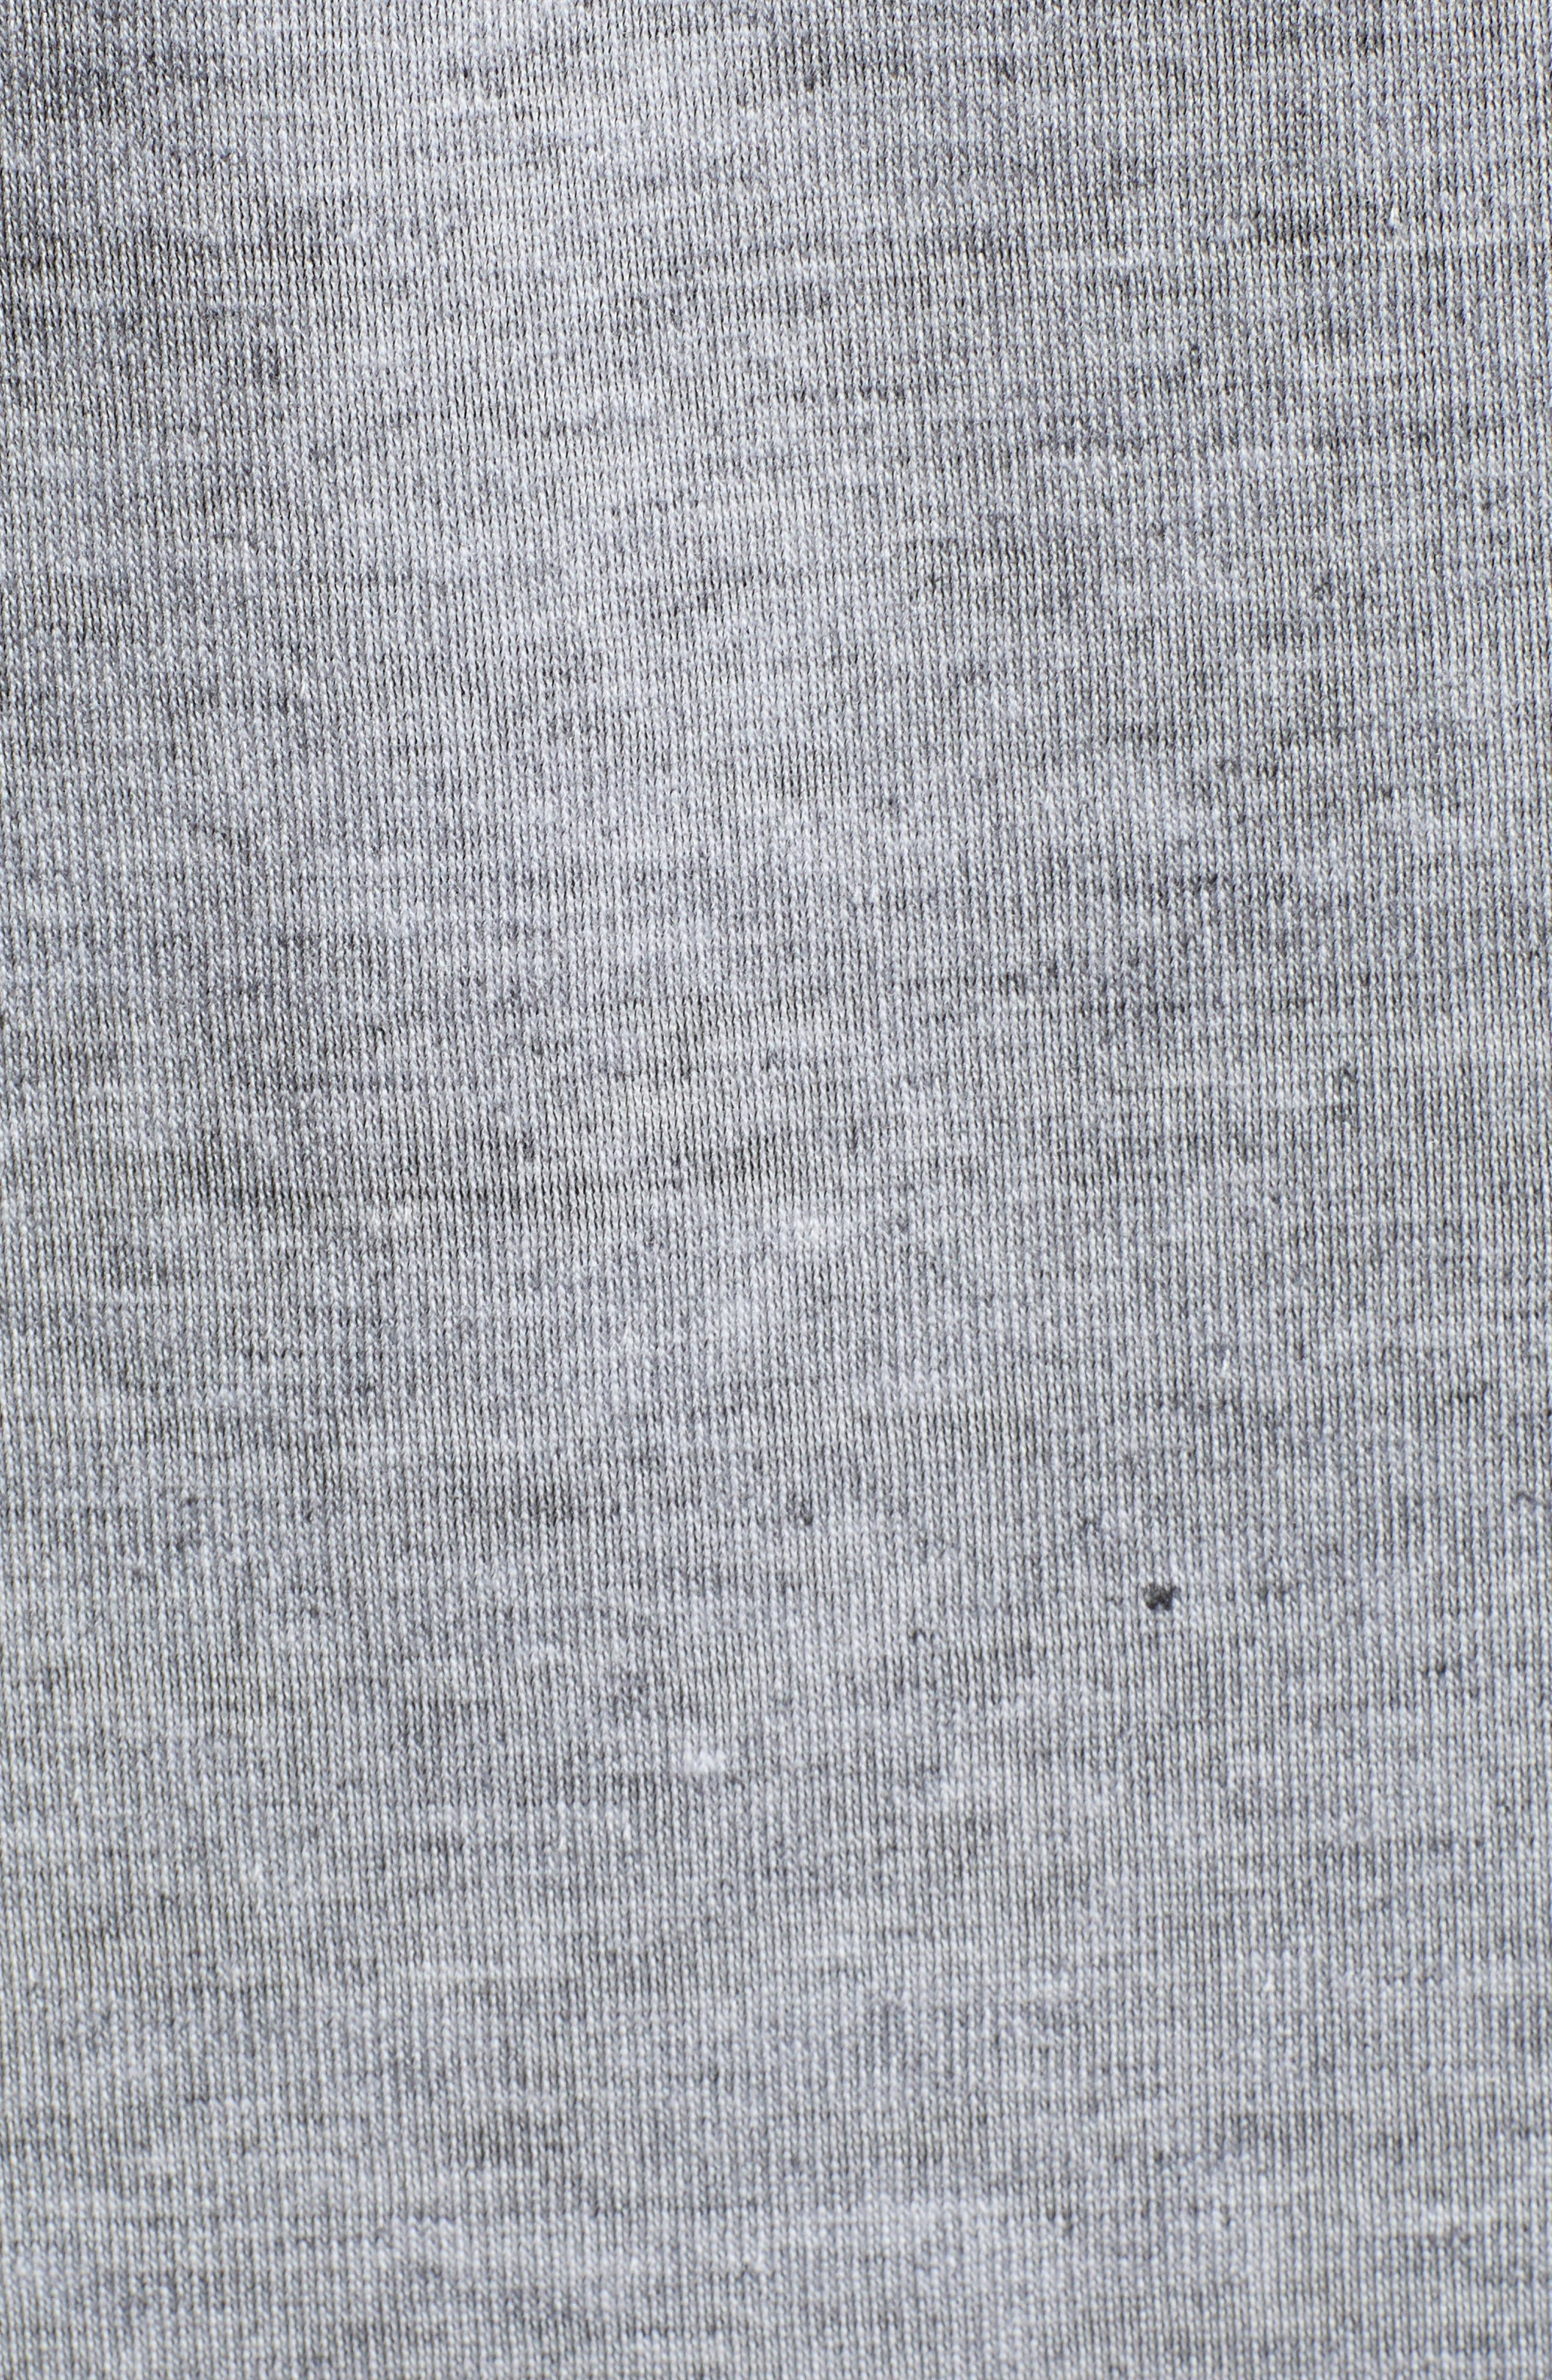 Sommers Love Hearts Sweatshirt,                             Alternate thumbnail 5, color,                             020